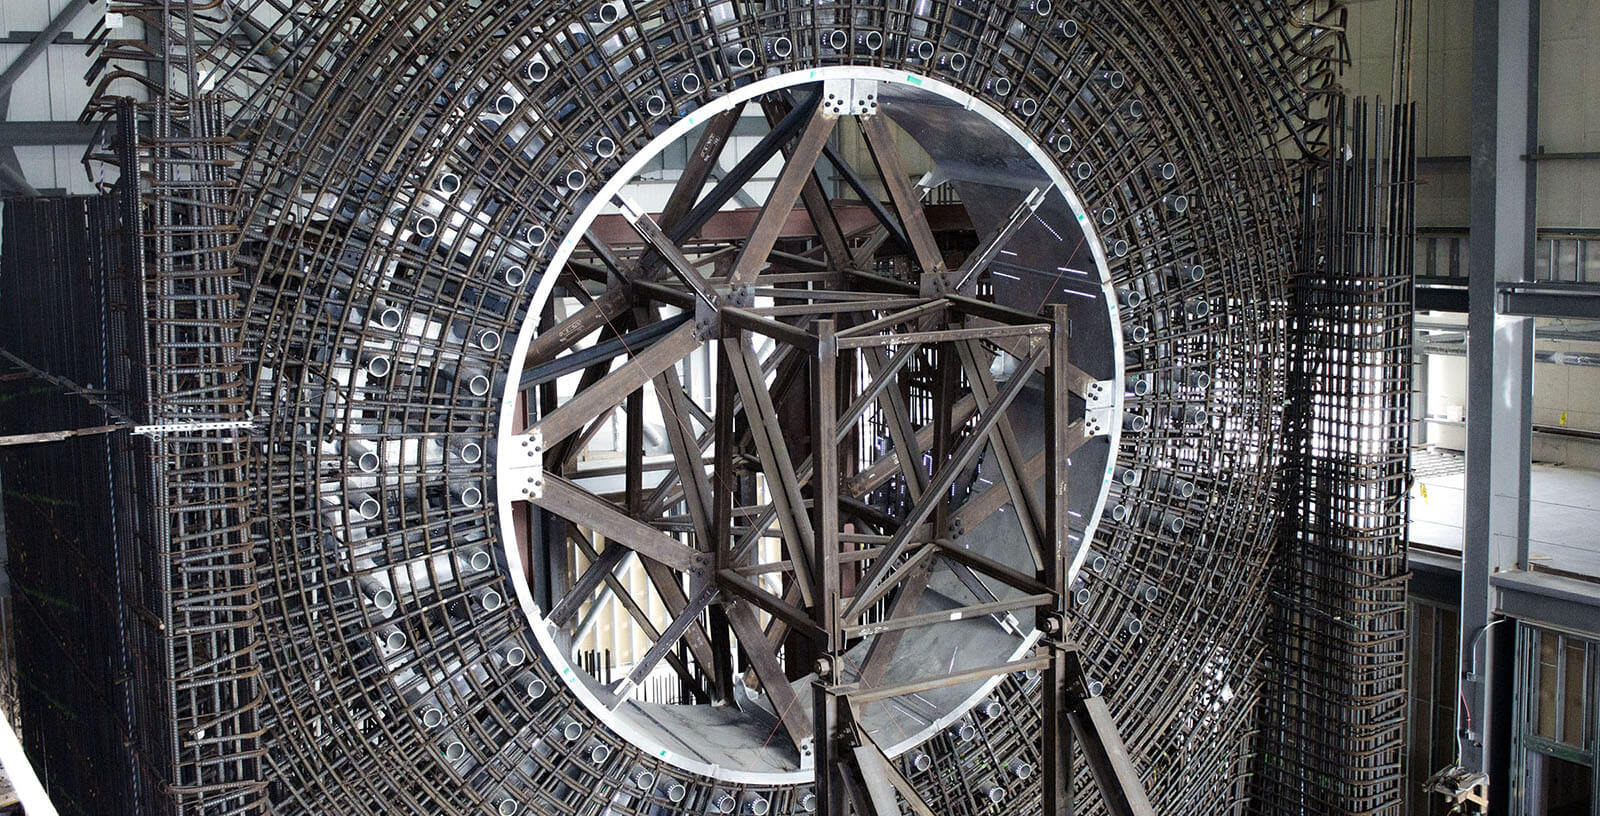 CLEMSON_Windturbine_drivetrain_test_facility_Test_Rig_USA_ADA_Idom__3_